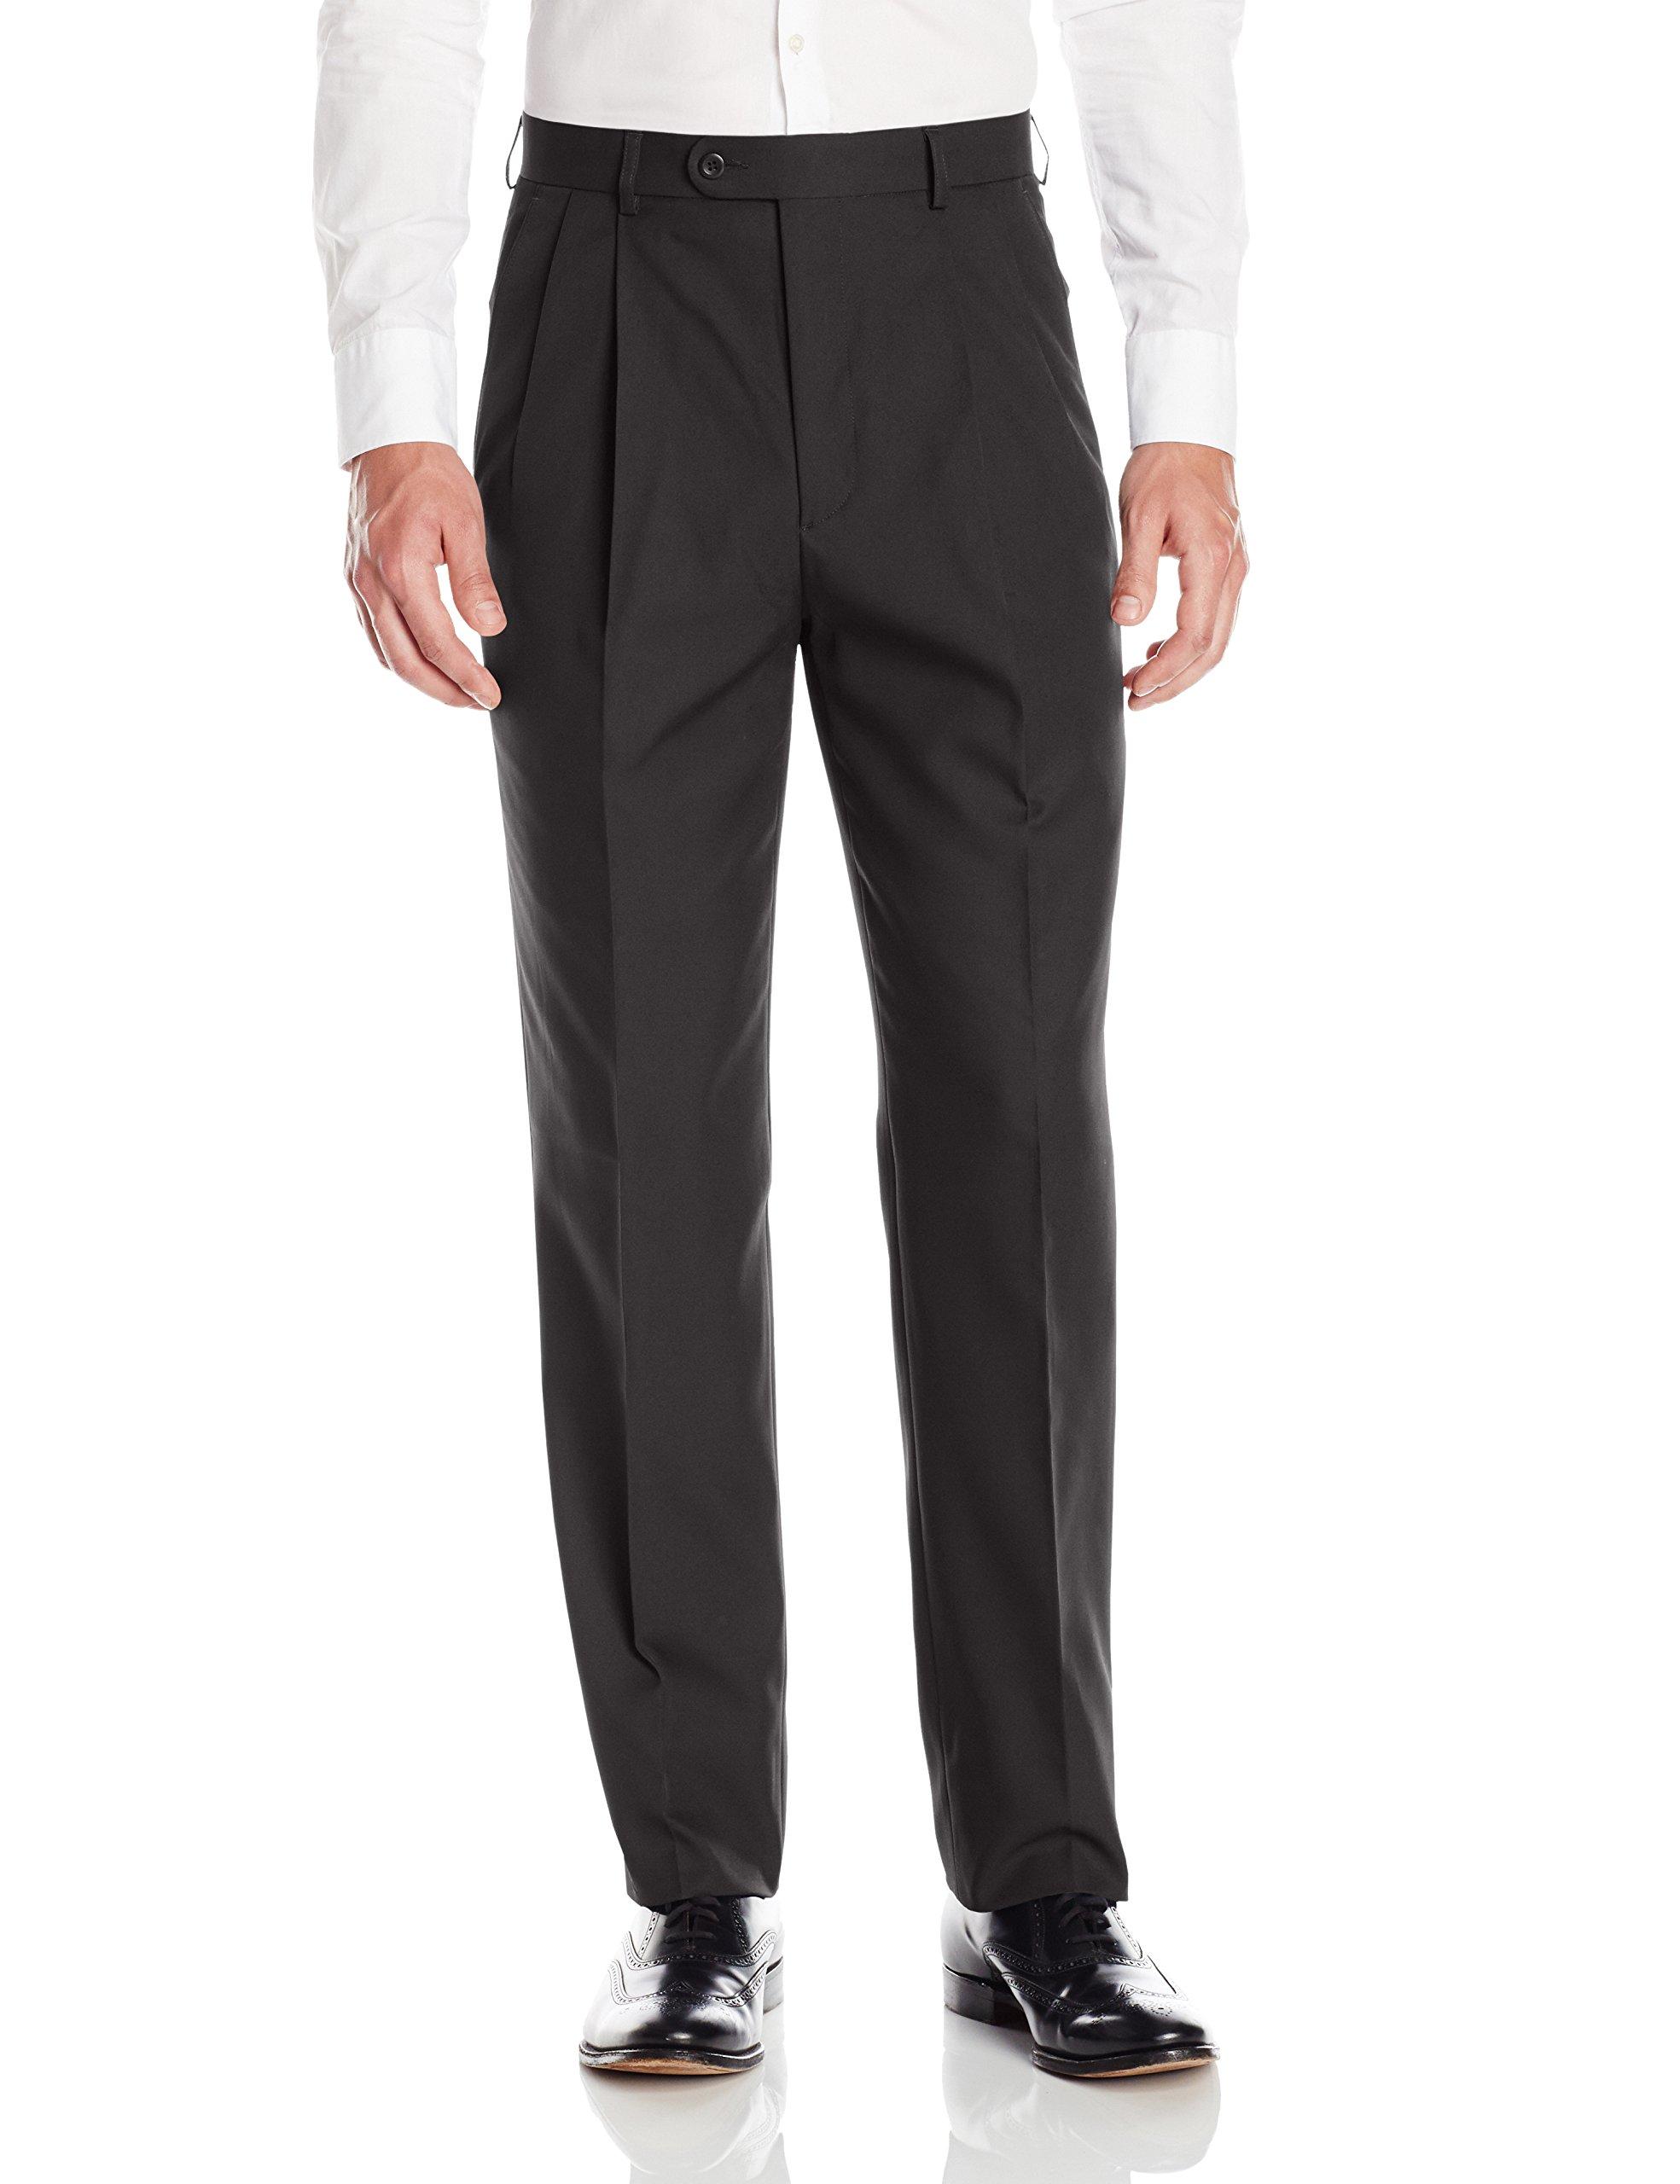 Linea Naturale Men's Pleated Washable Microfiber Twill Trouser, Black, 35W